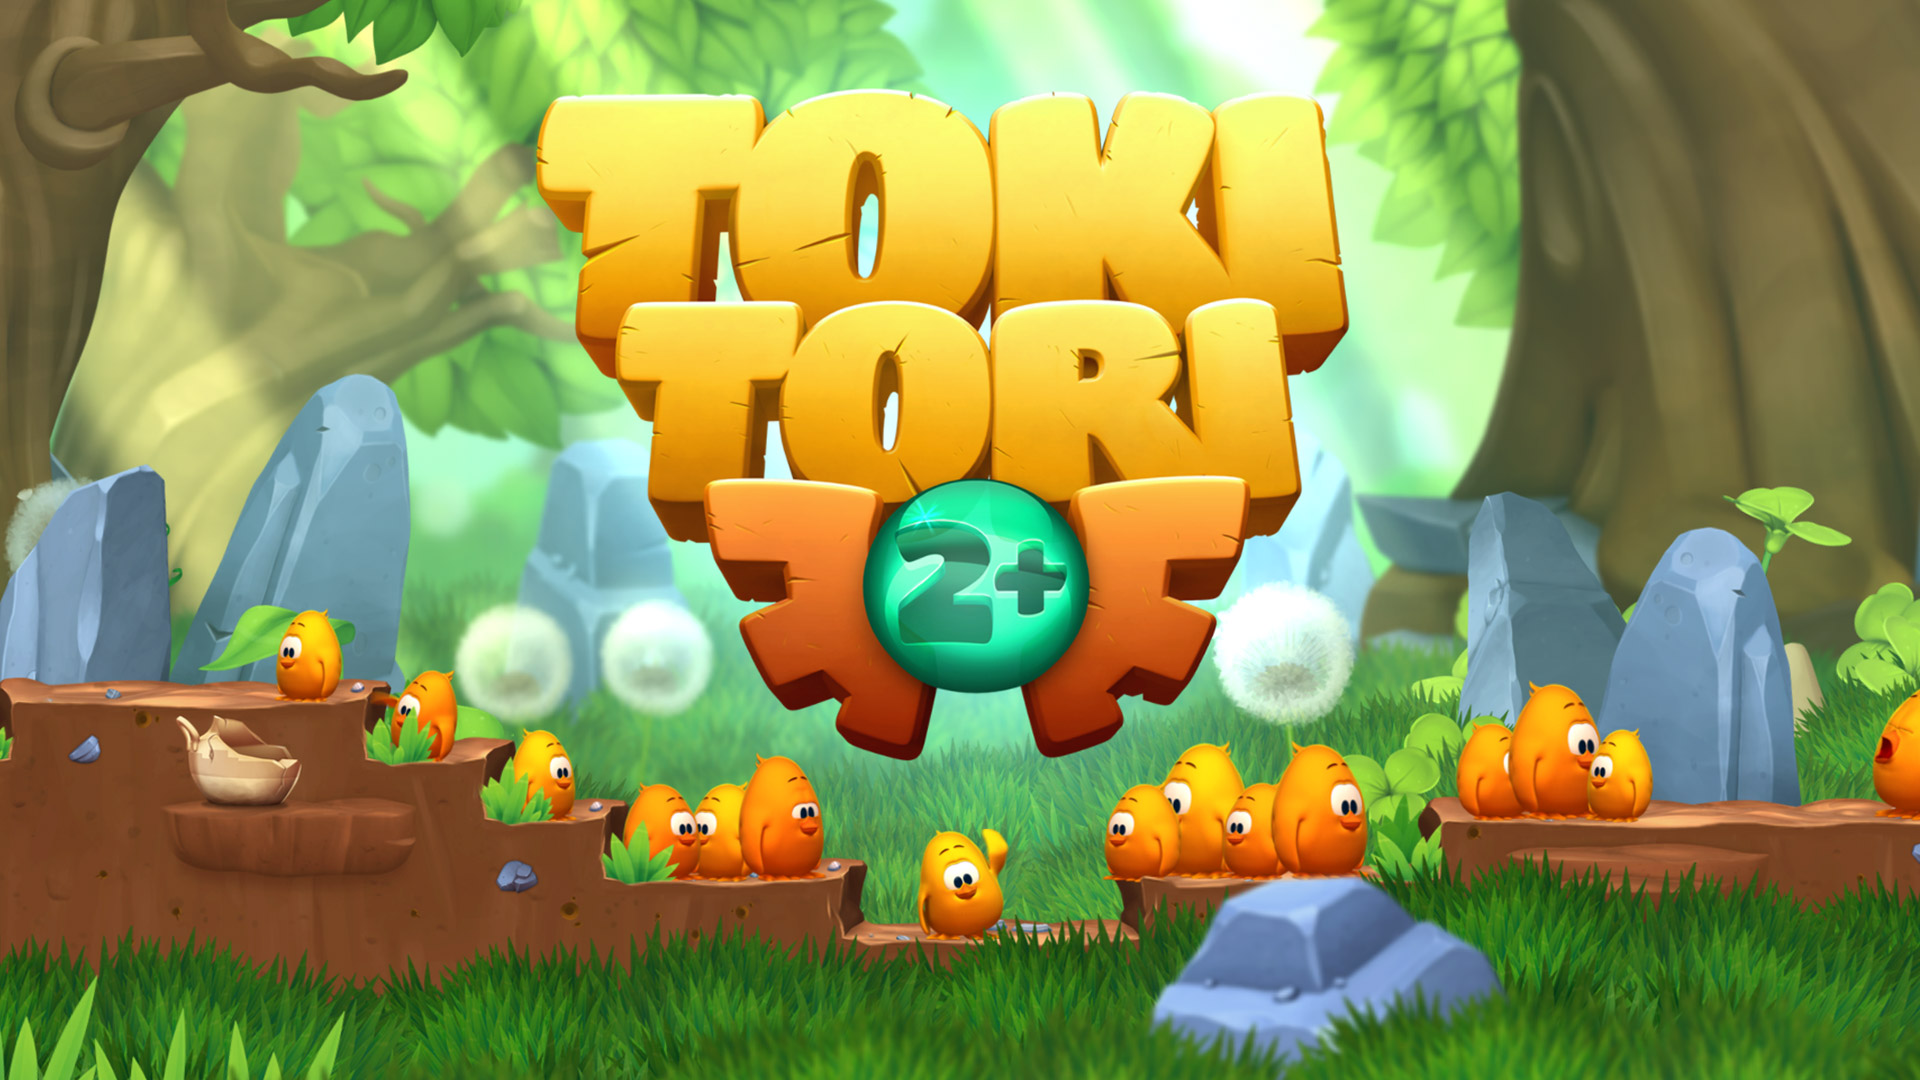 Free Toki Tori 2 Wallpaper in 1920x1080